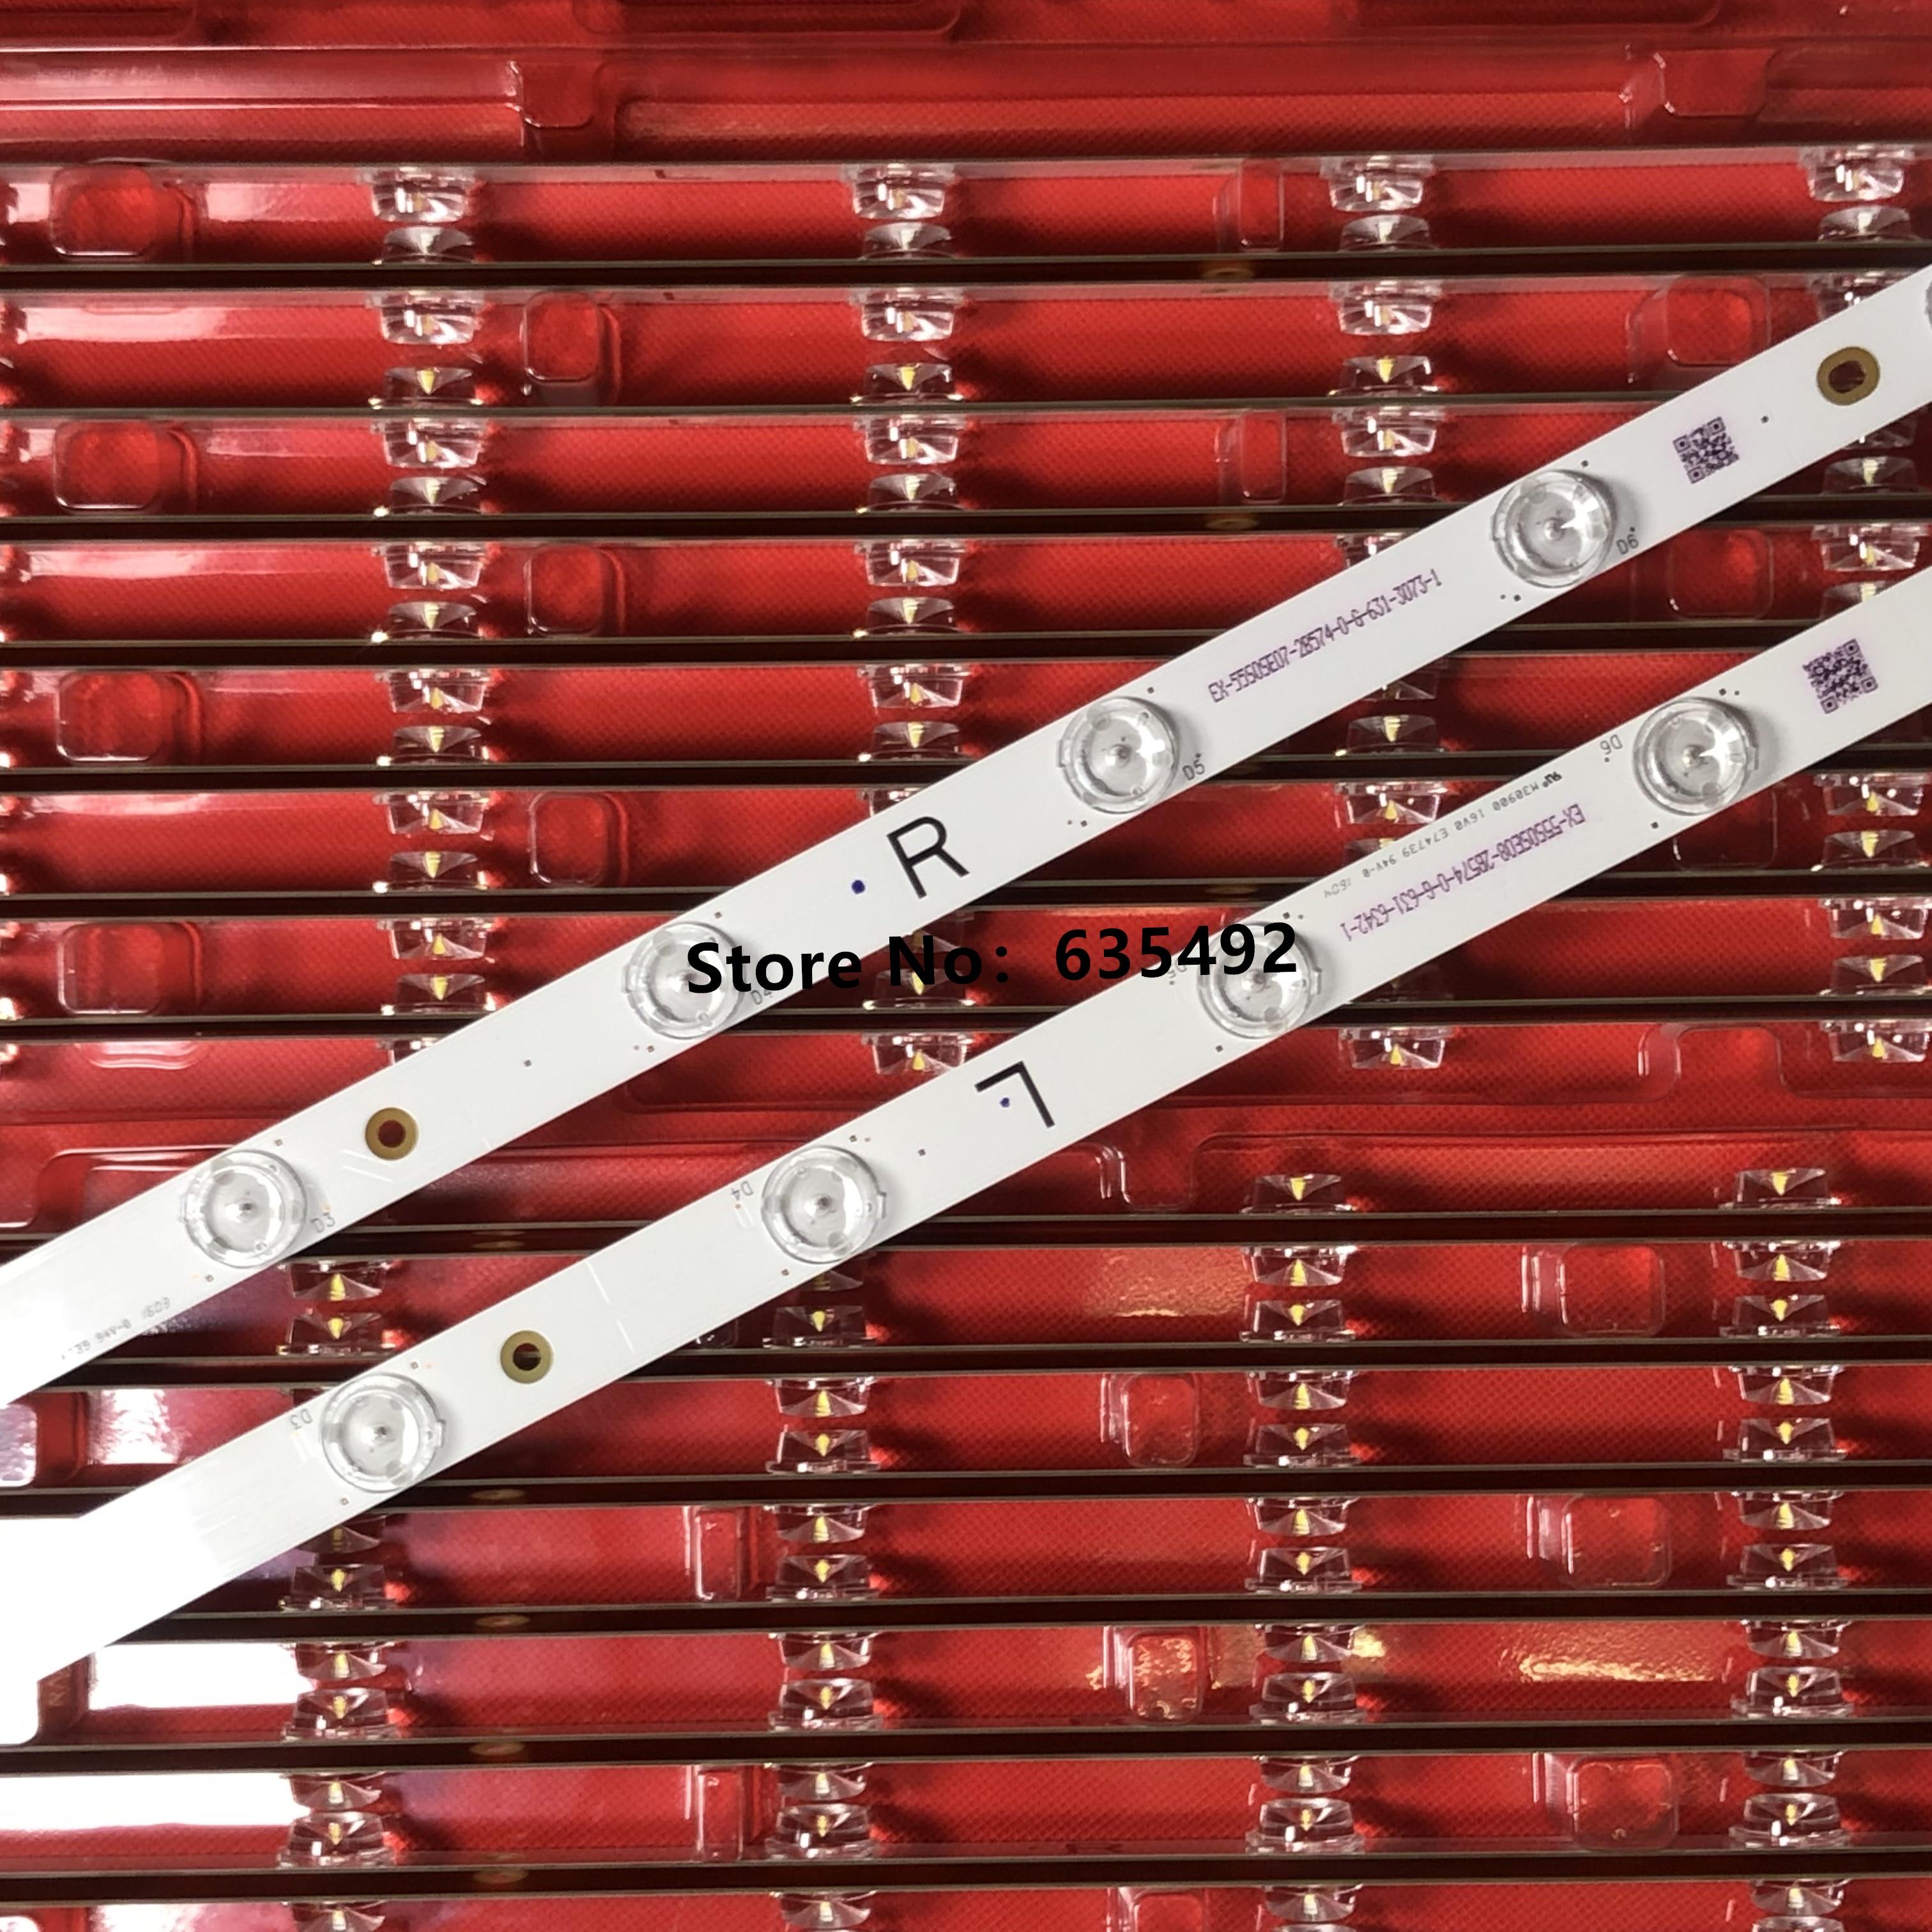 100% Новинка 16 шт. (8R + 8L) светодиодный комплект подсветки для P anason ic TX-55DX603E TX-55DX635E L5EDDYY00849 TB5509M 550TV01 550TV02